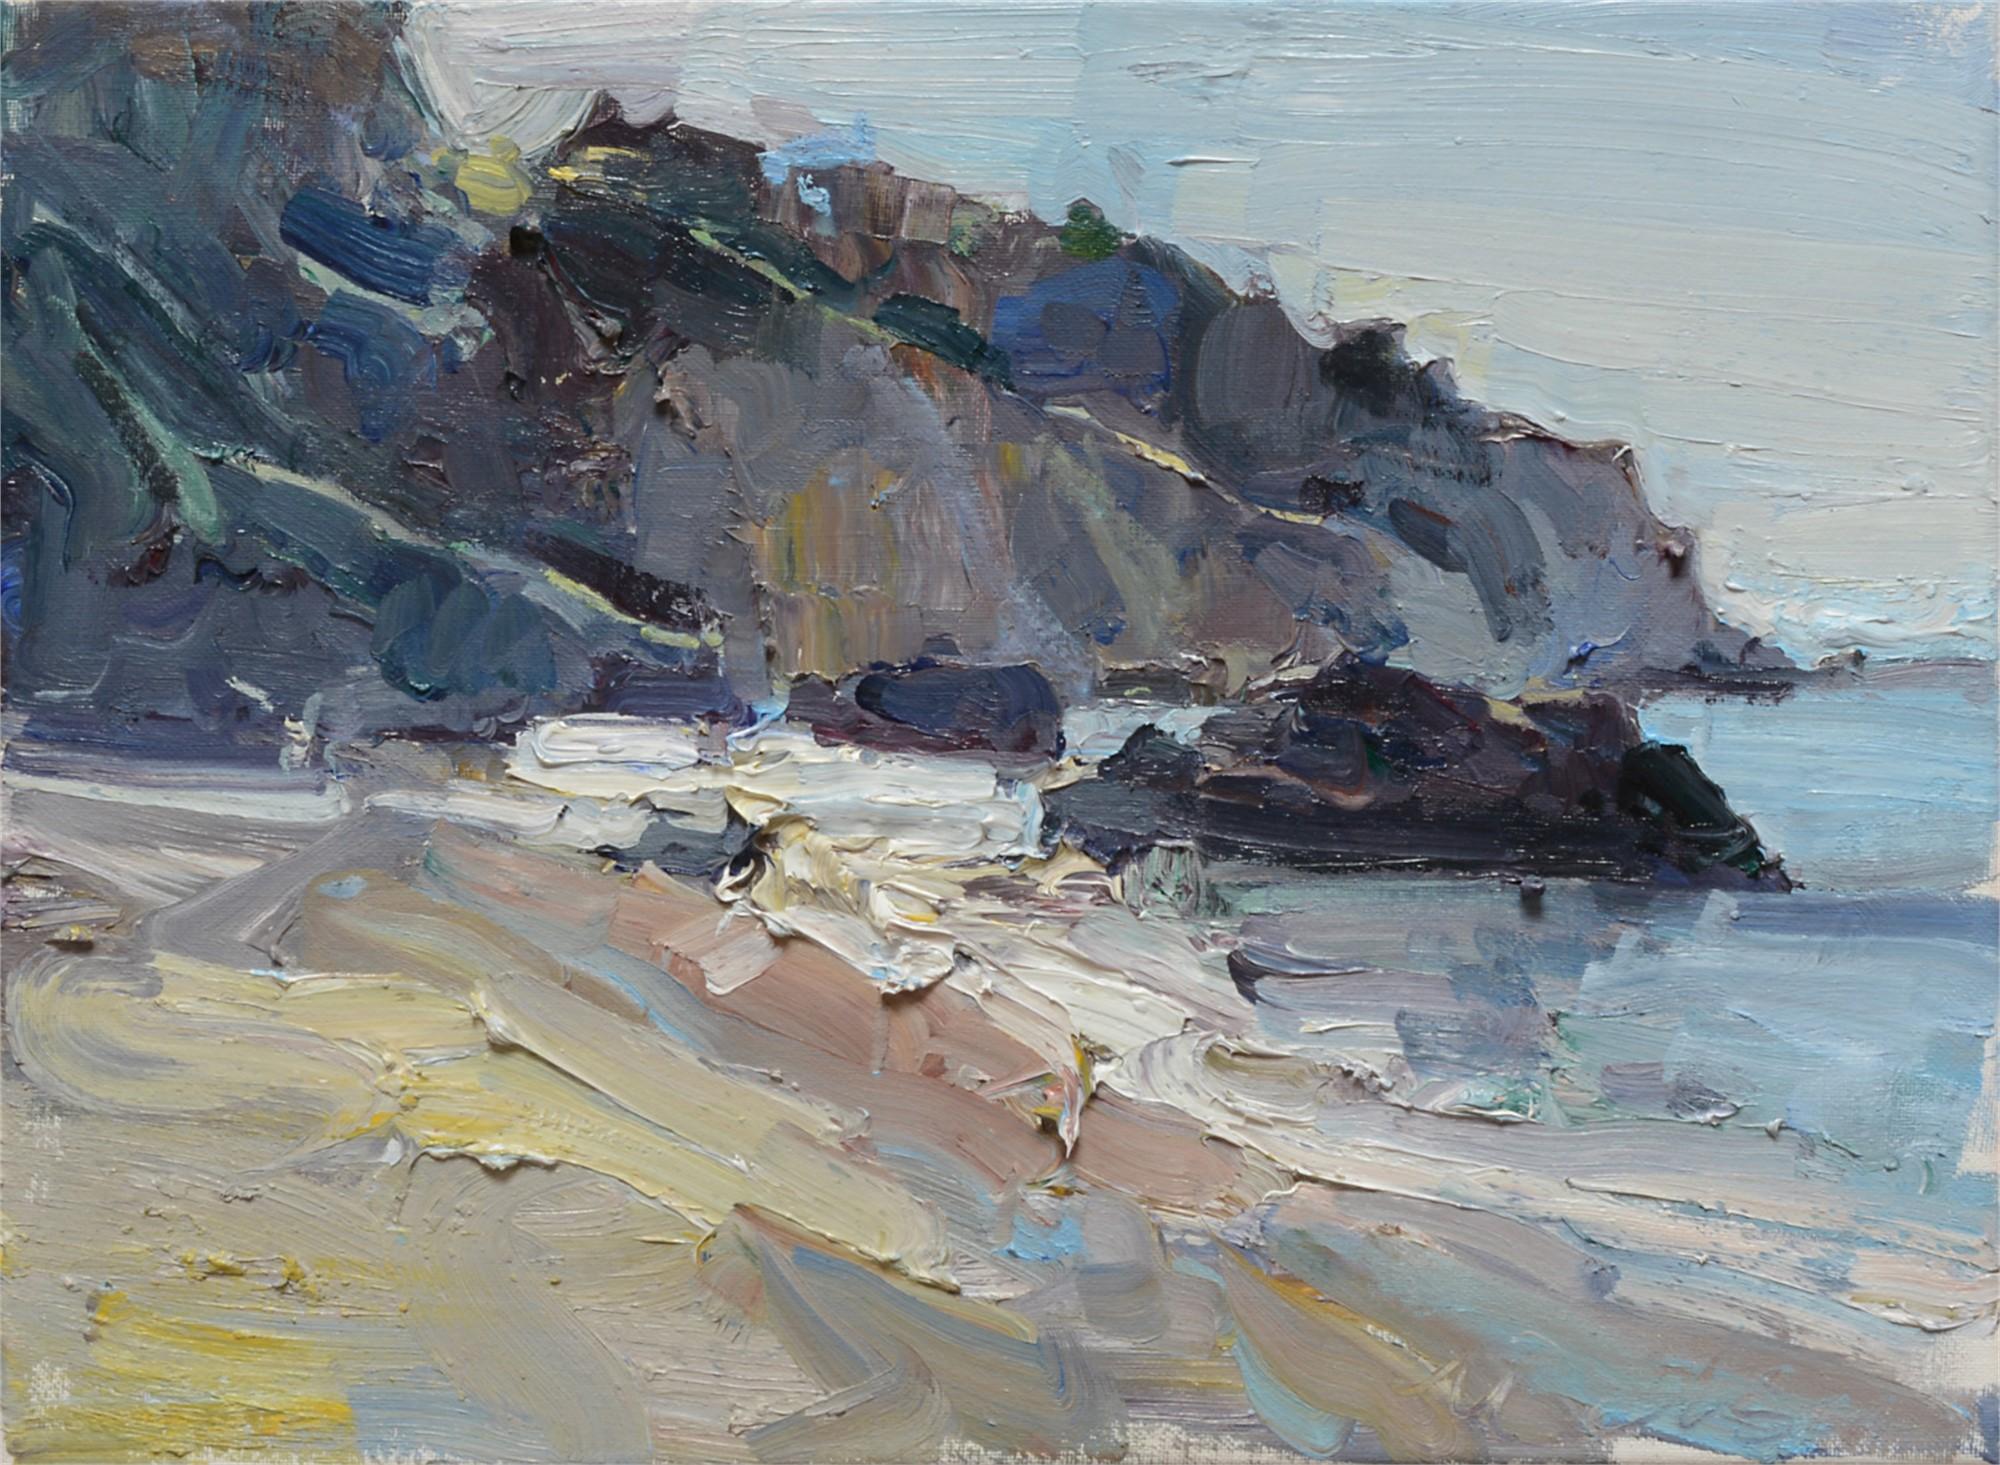 China Beach by Mikael Olson